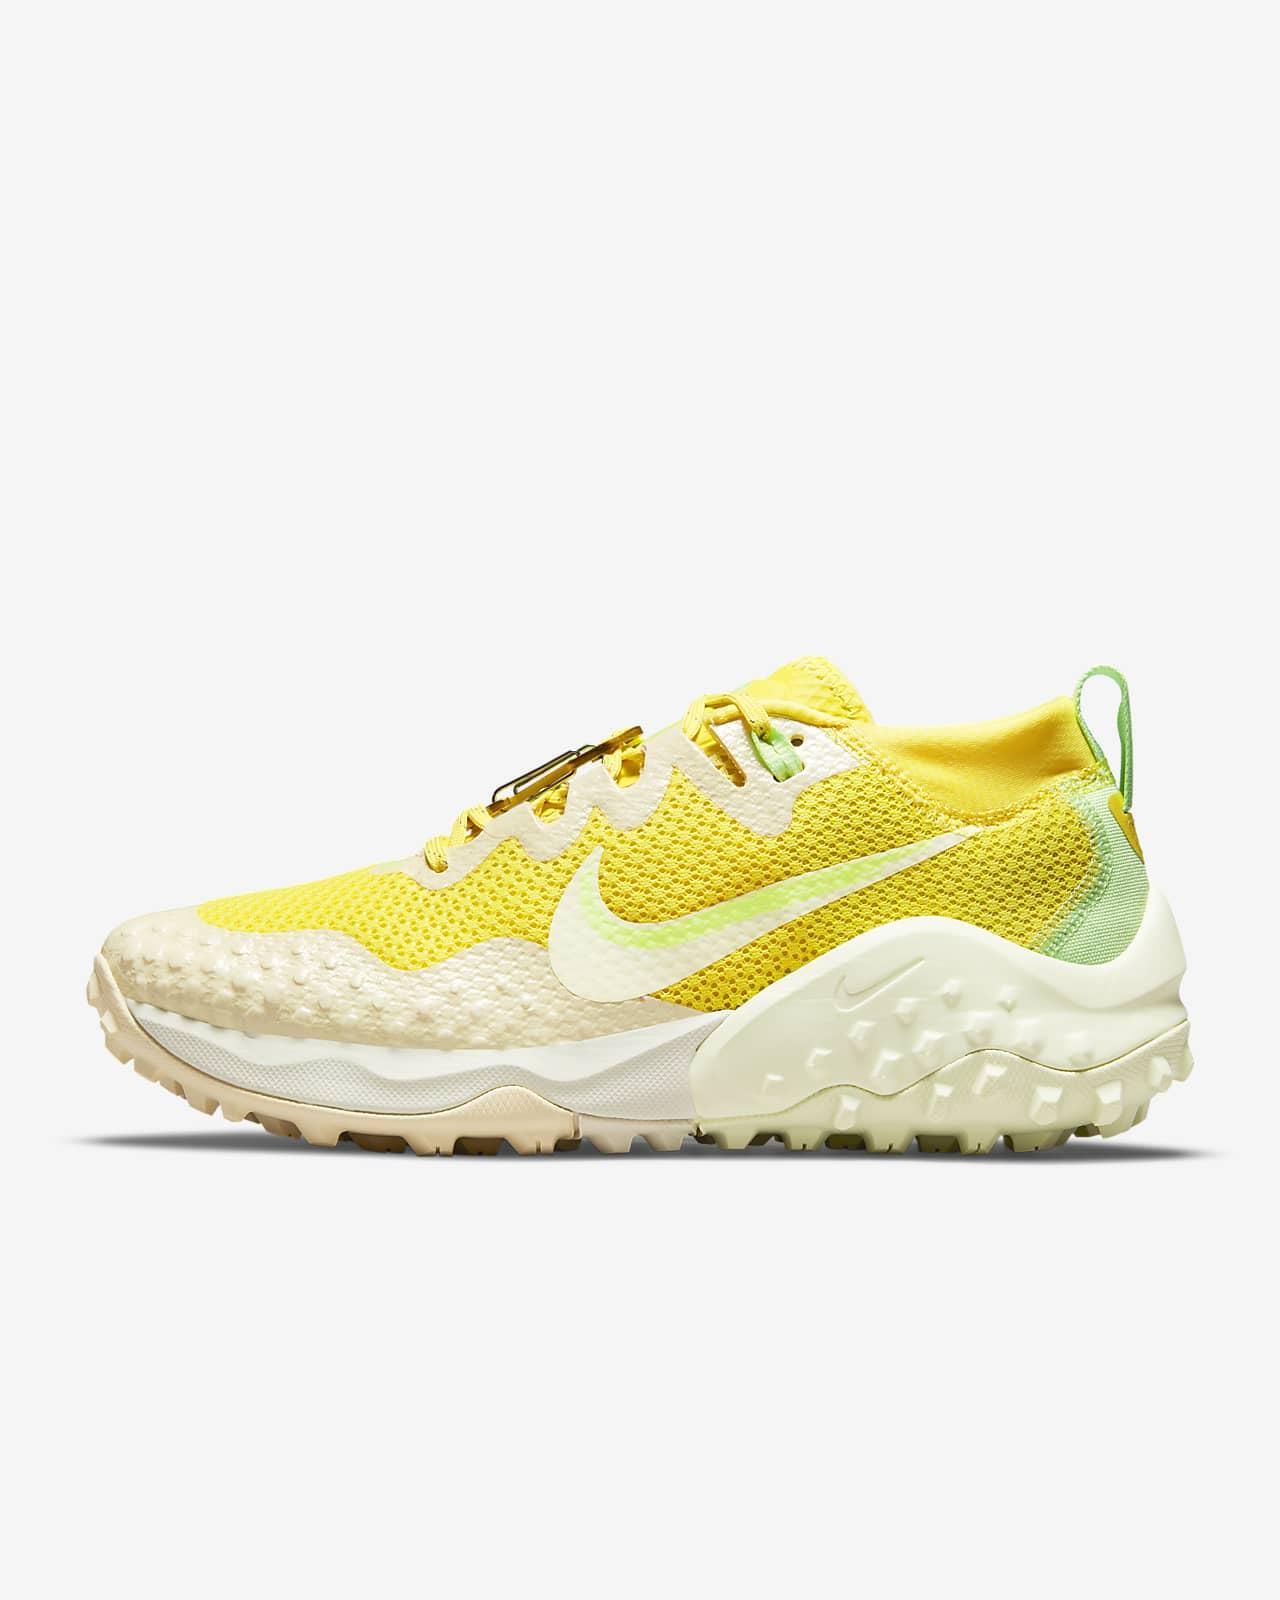 Chaussure de trail Nike Wildhorse 7 pour Femme. Nike LU